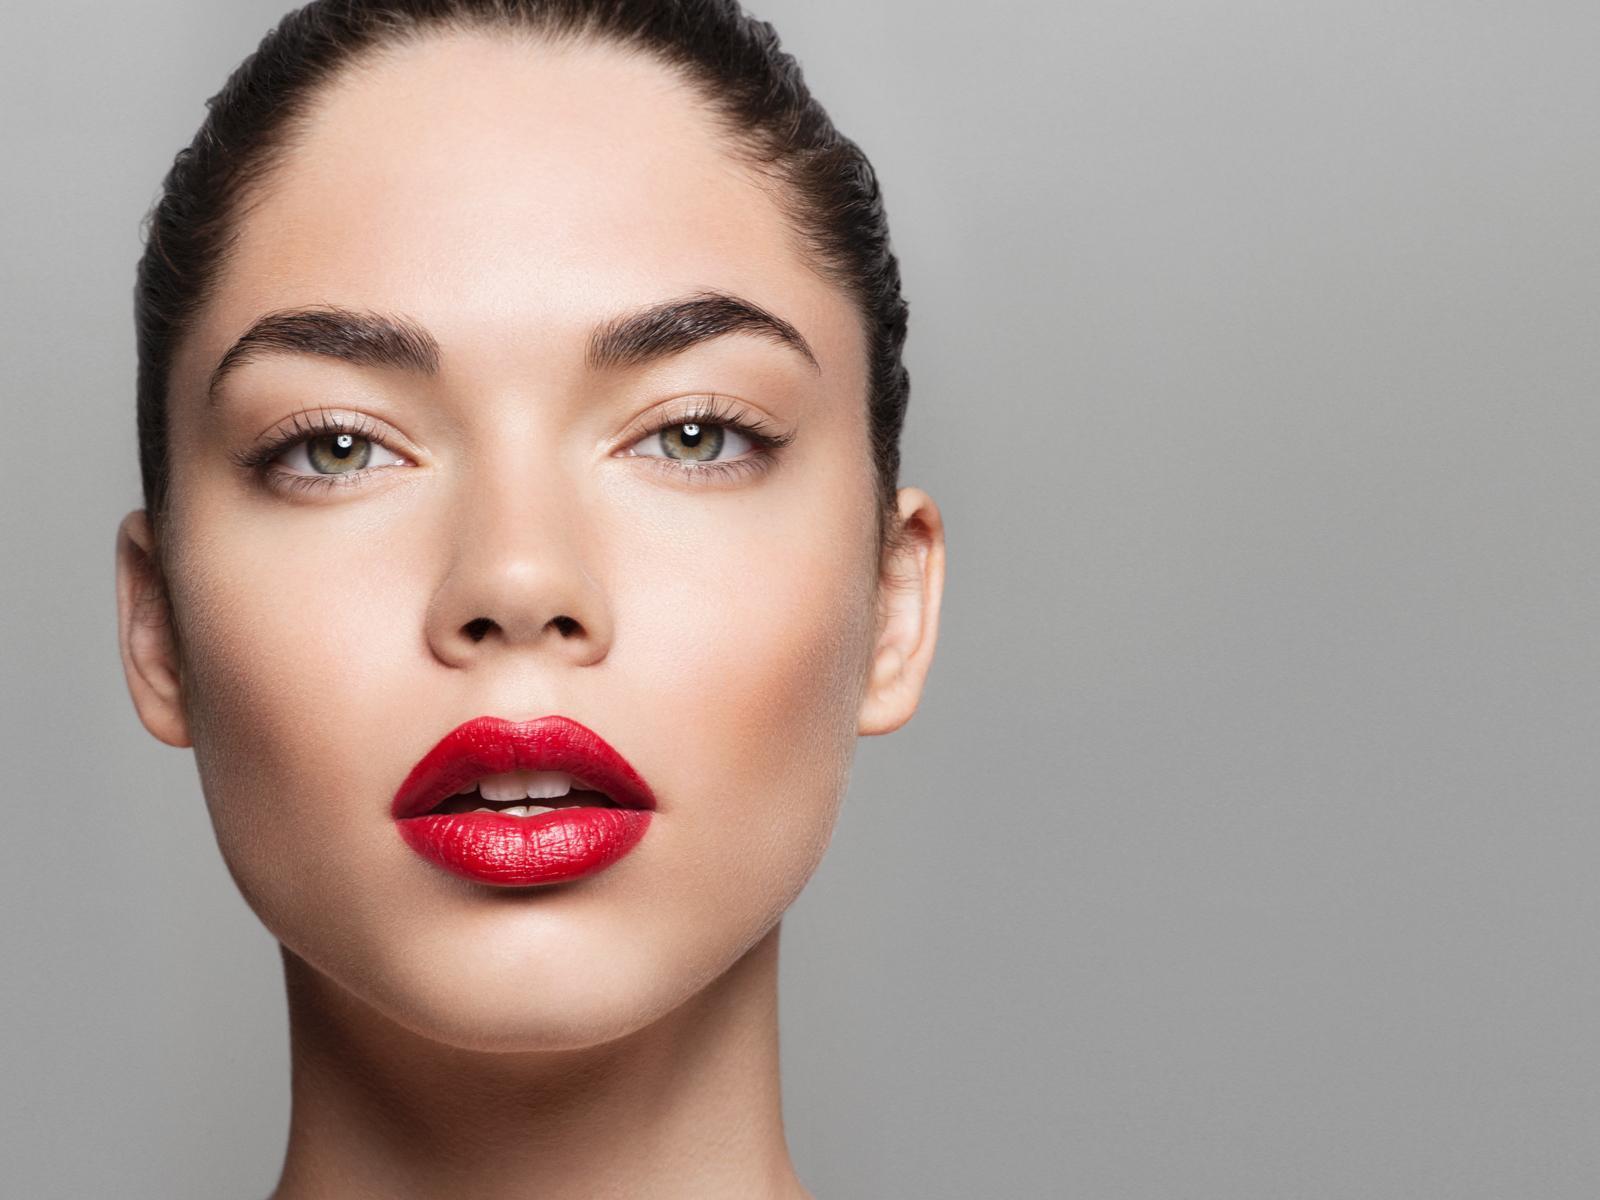 Perfect Lips - Lip Filler